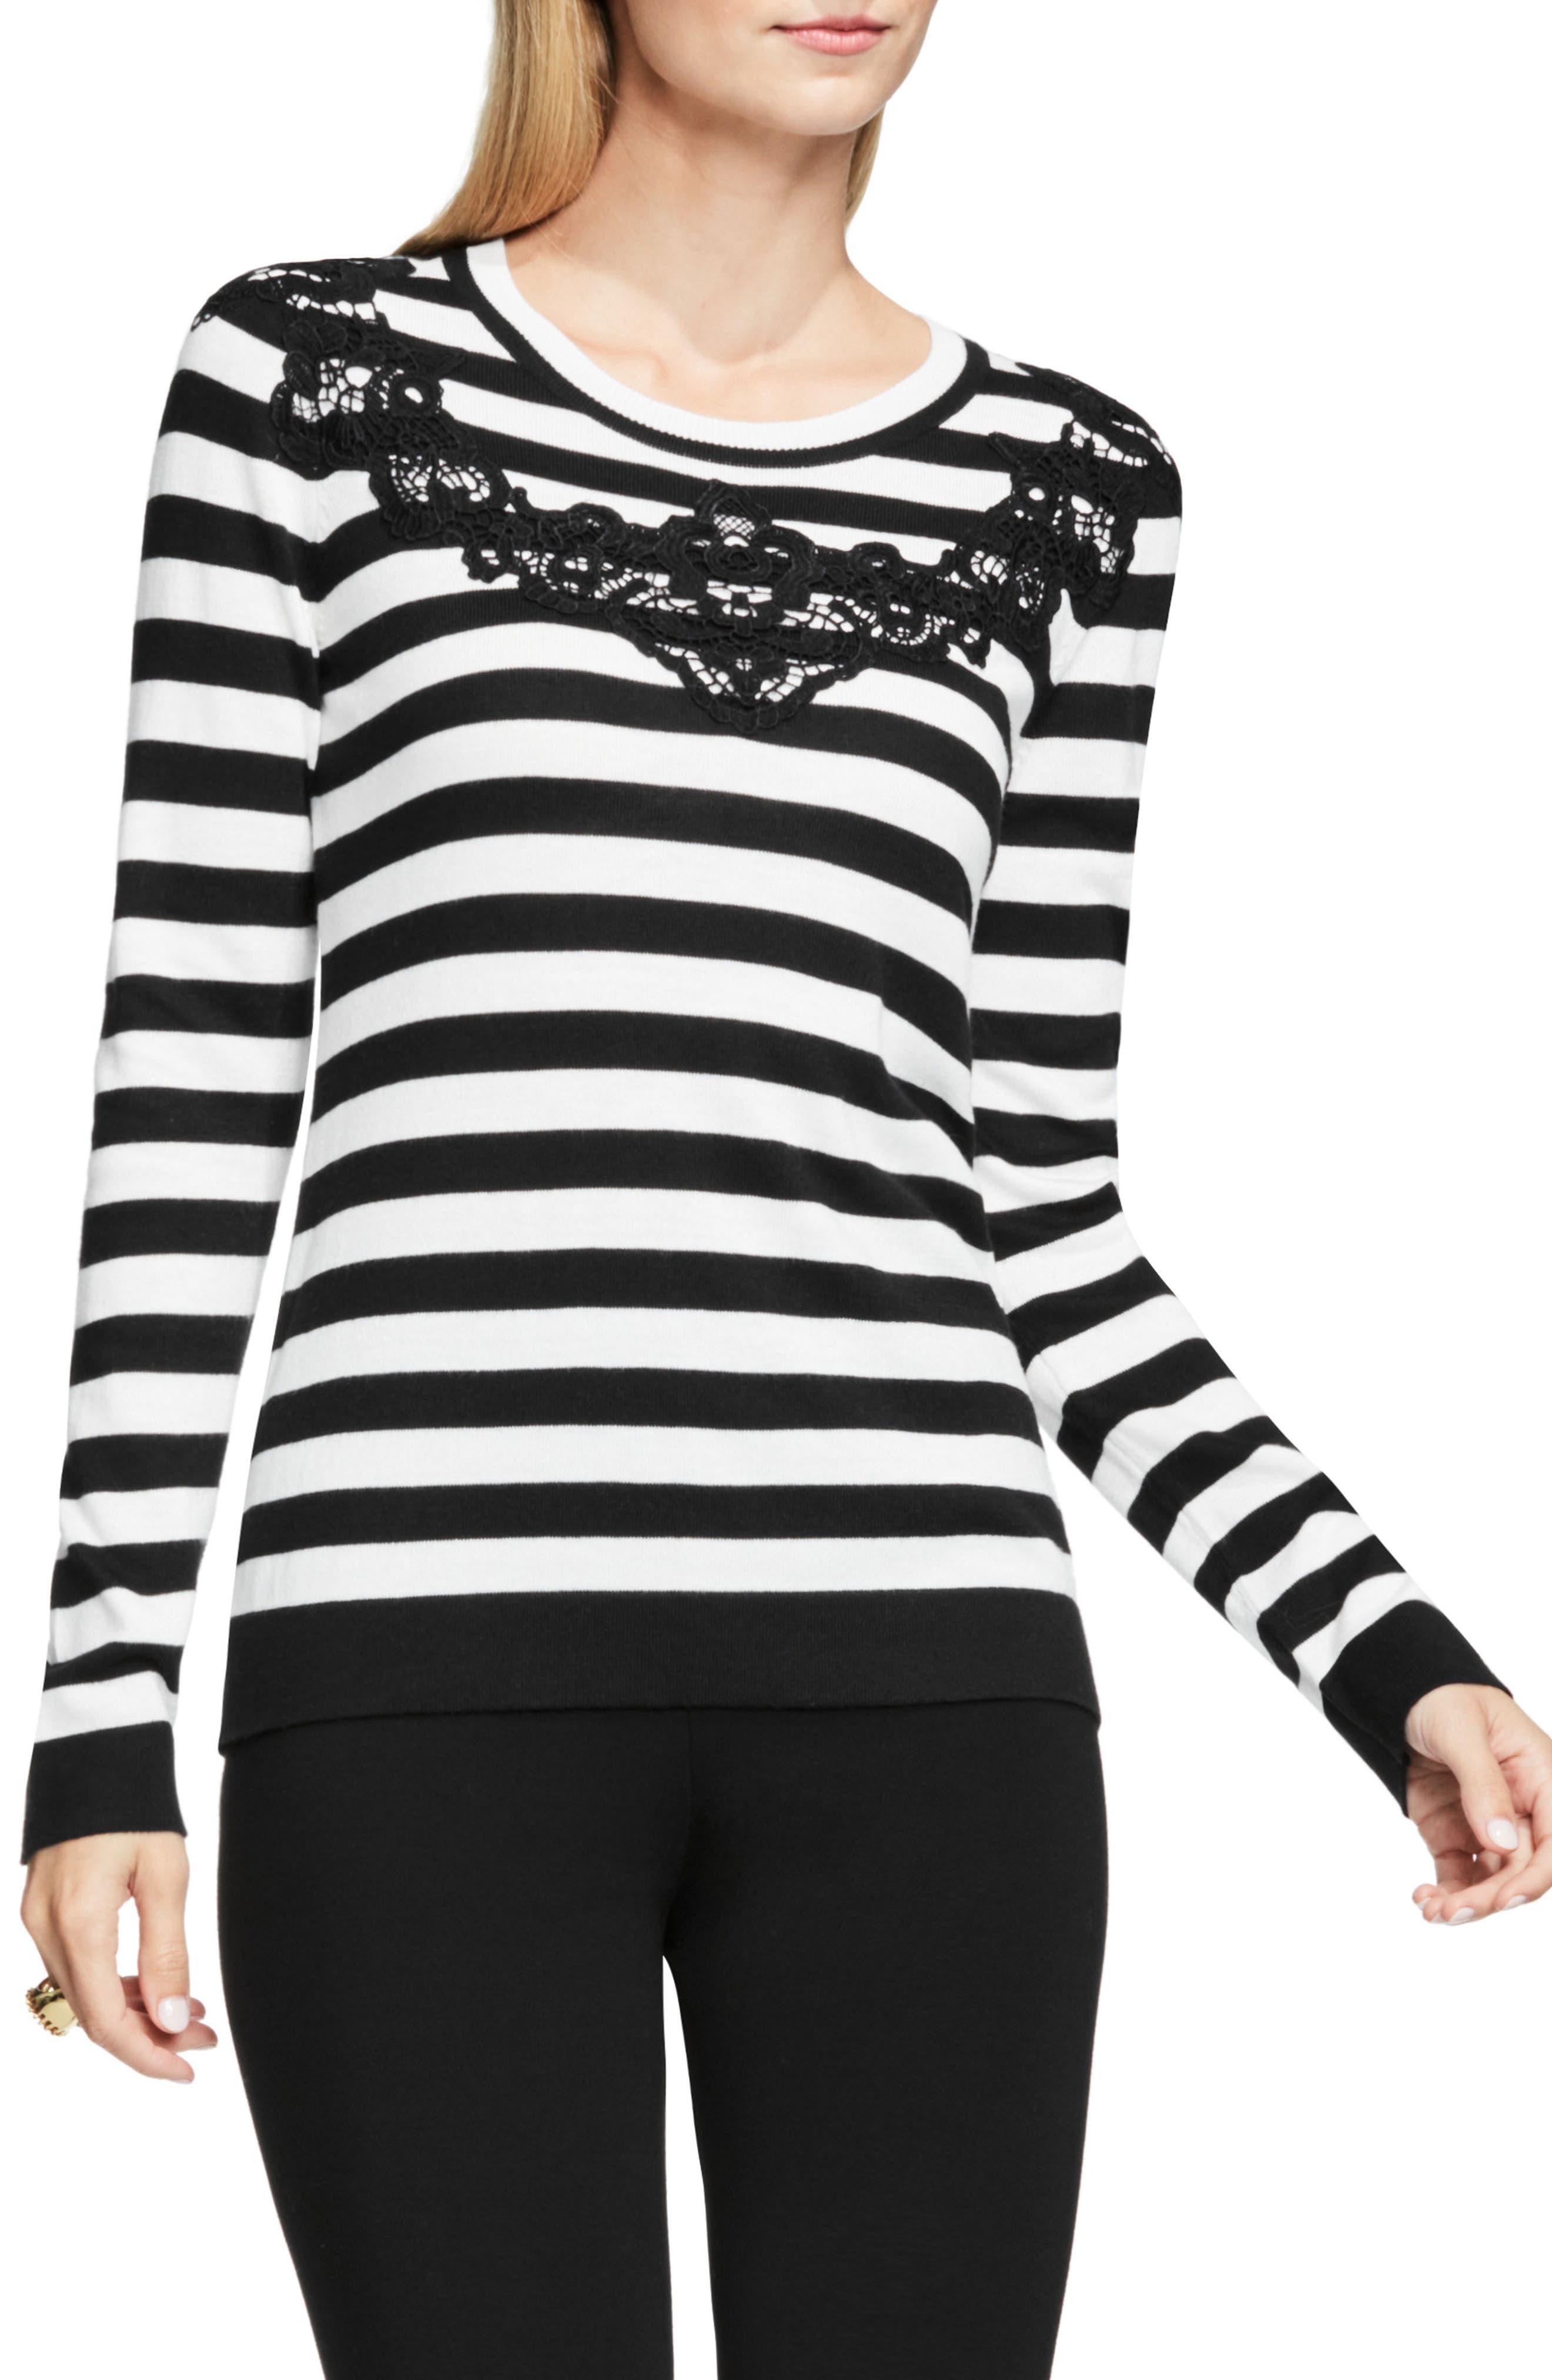 Alternate Image 1 Selected - Vince Camuto Lace Trim Stripe Sweater (Petite)